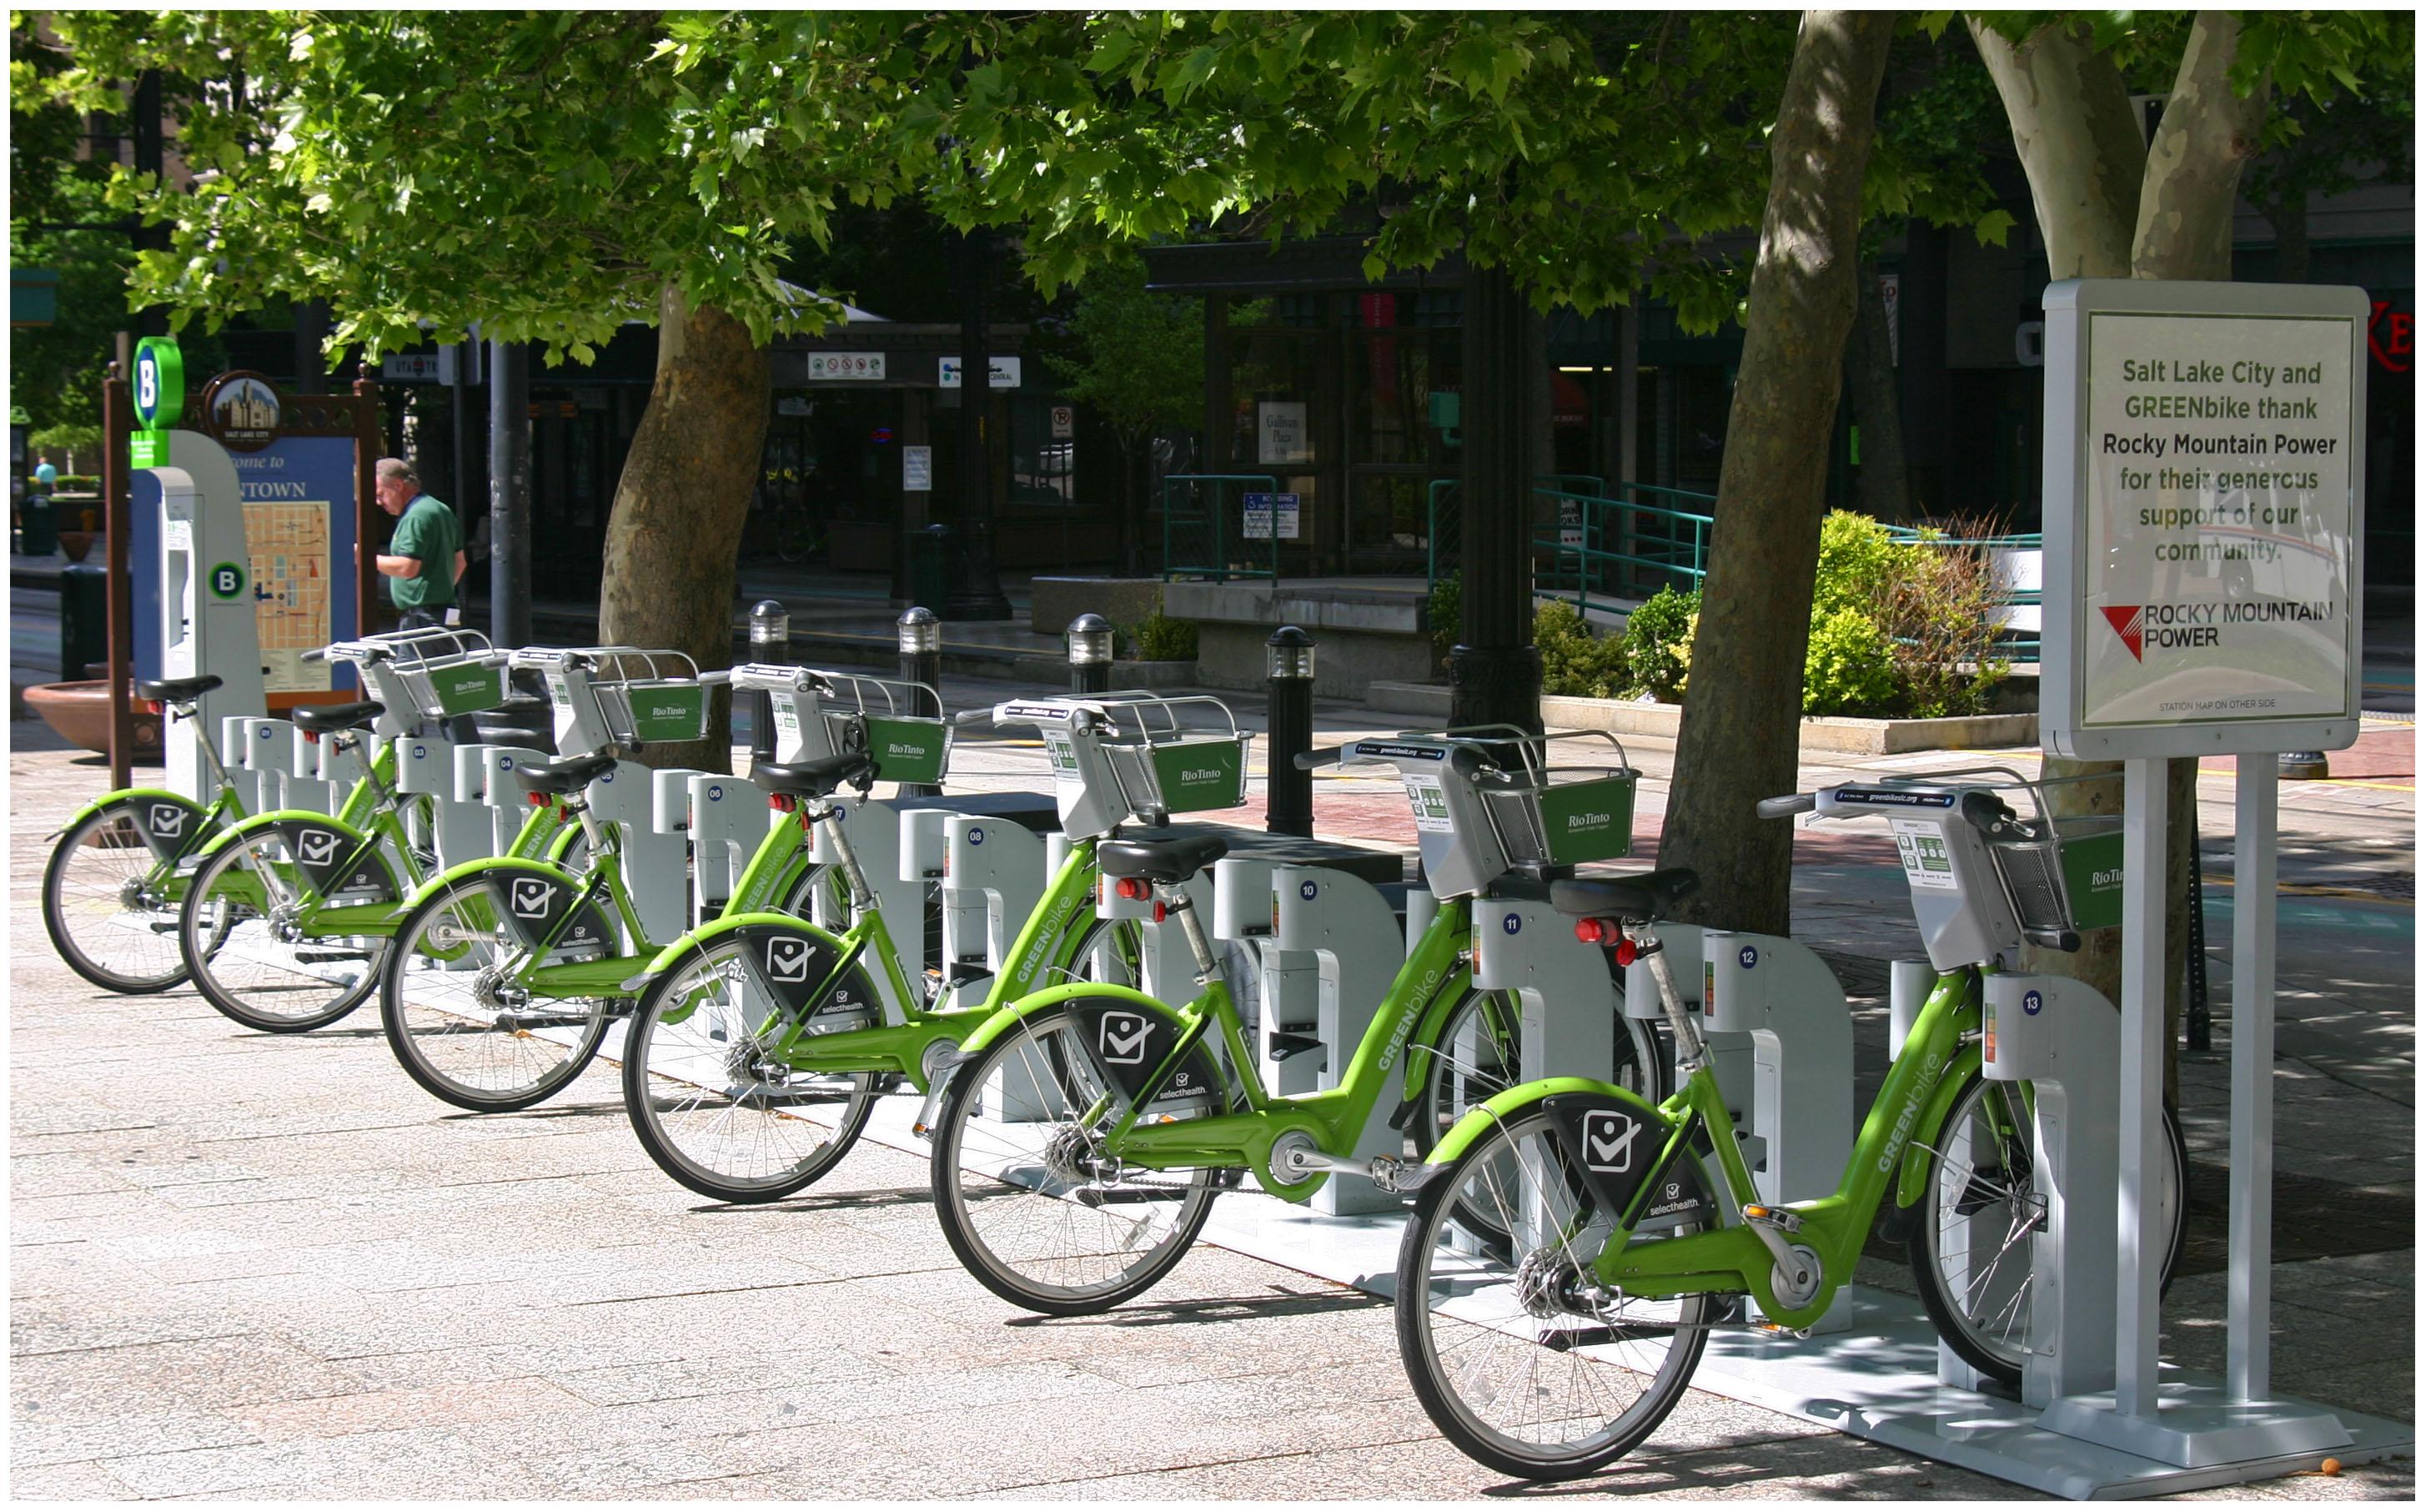 Bike City >> Salt Lake City GREENbike Station — UrbanCincy